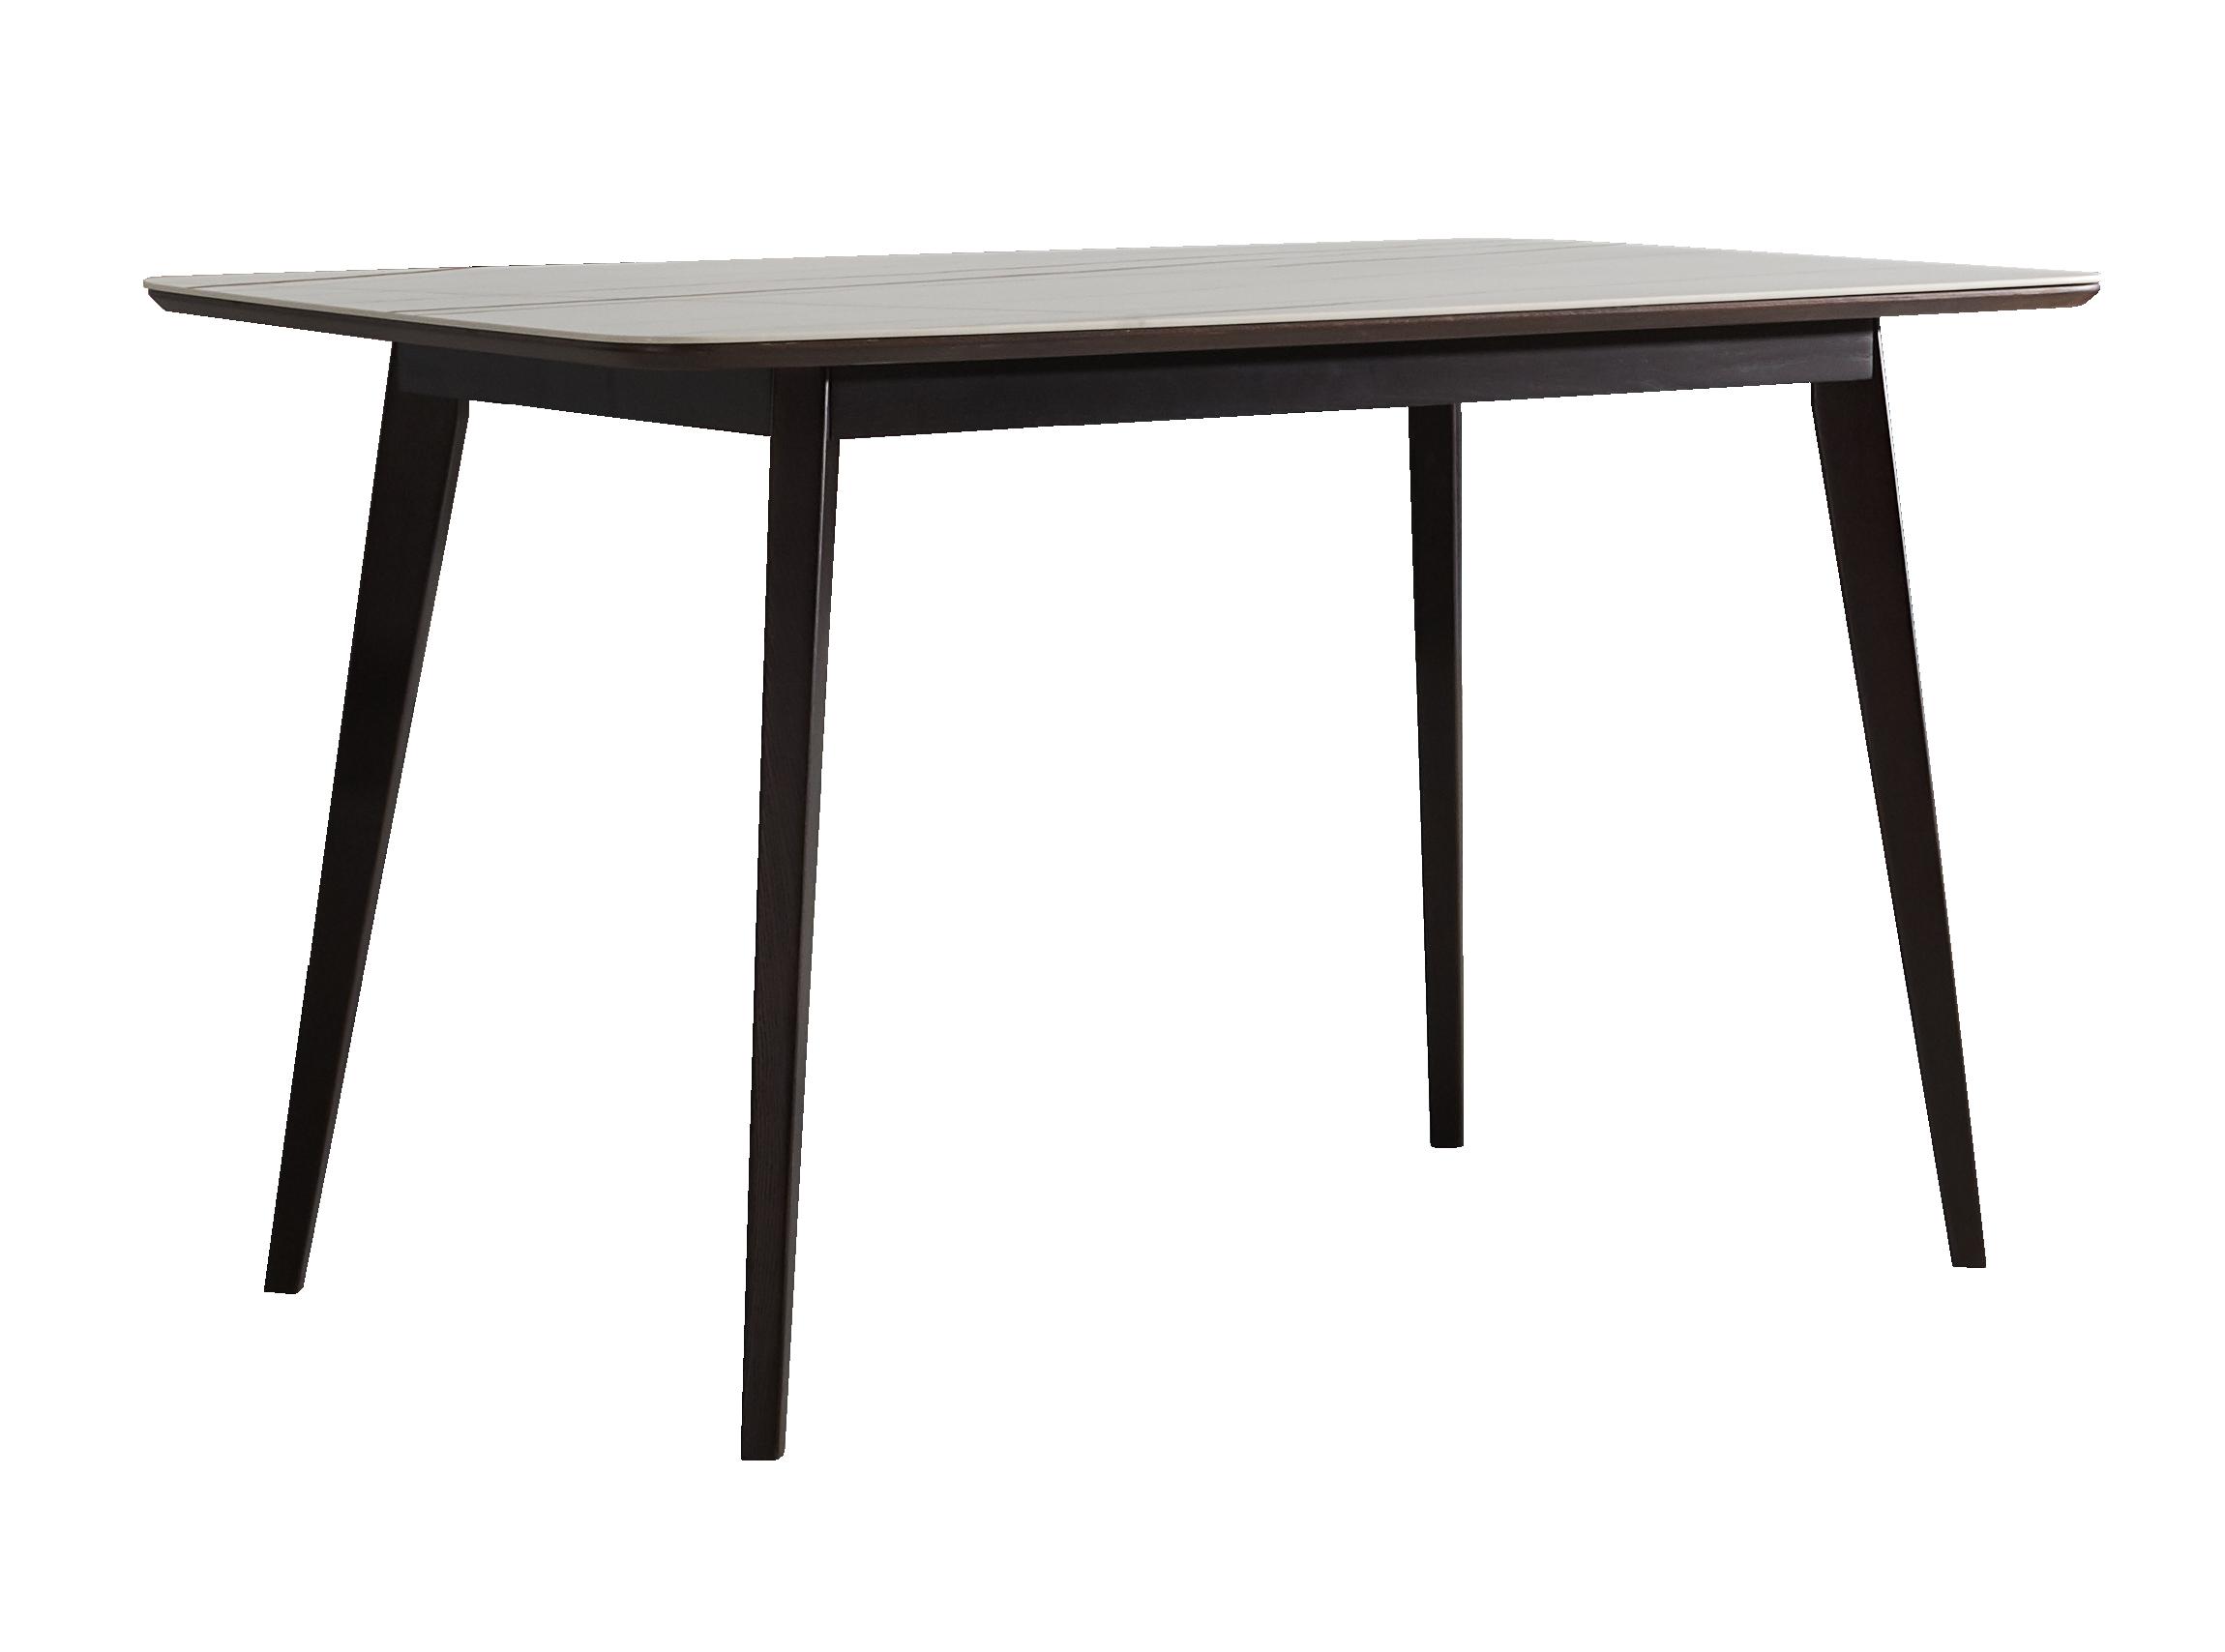 FY-10长餐桌